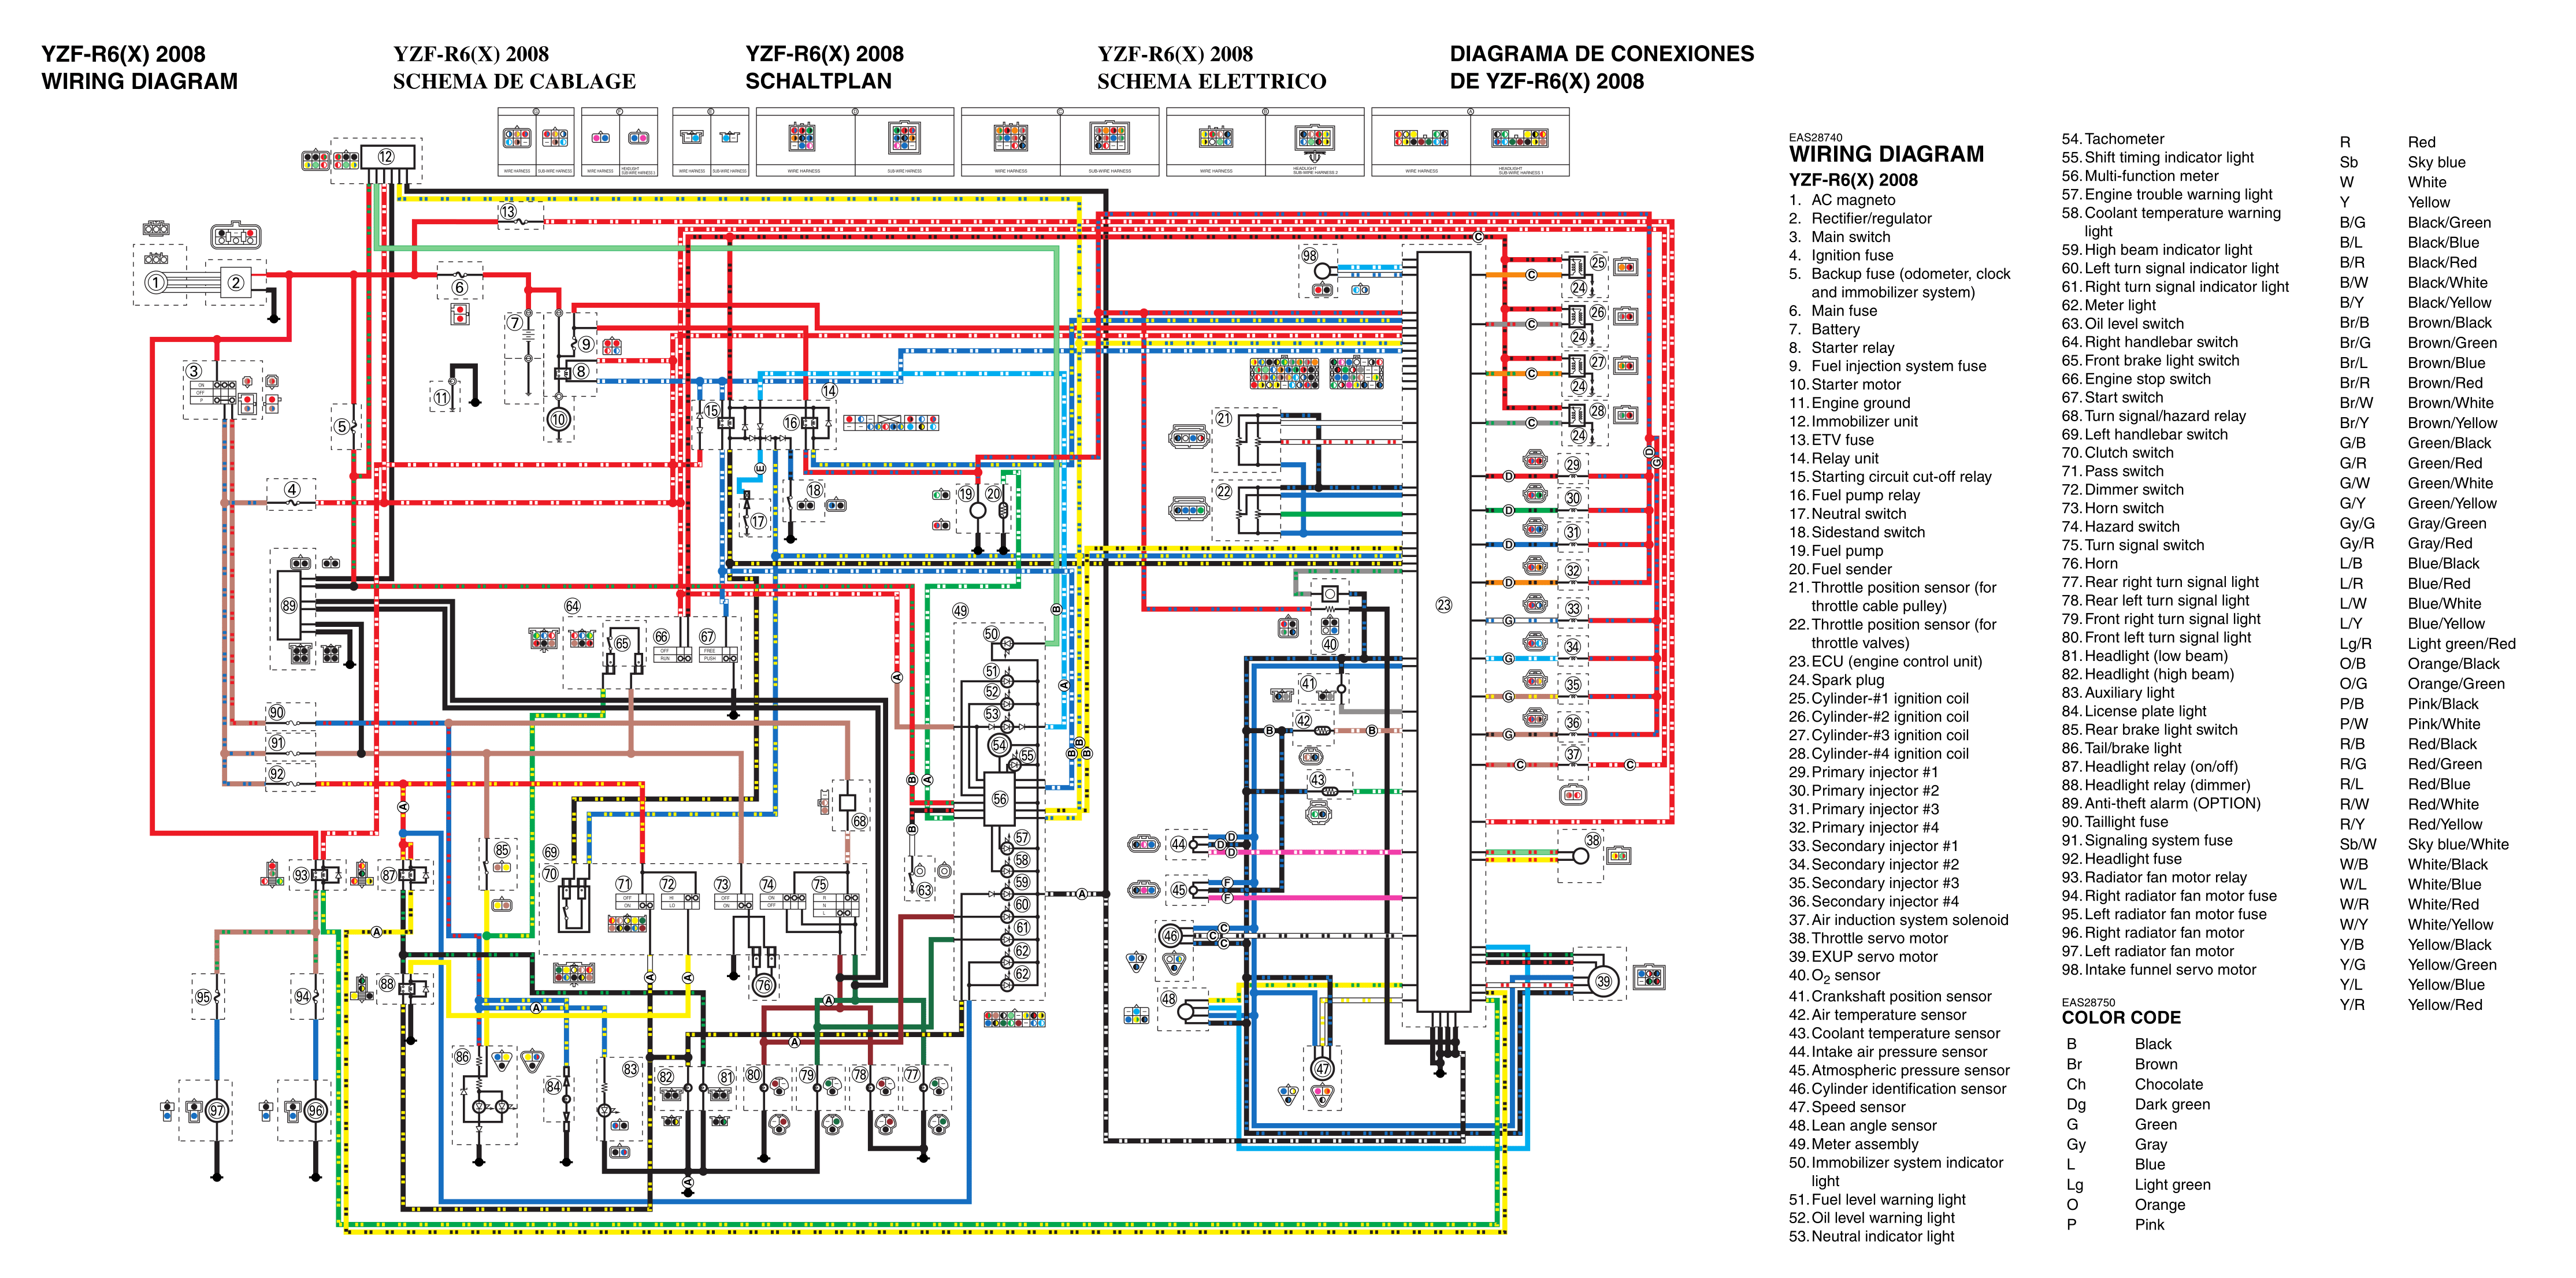 ag_5746] 2006 yamaha yzf r1 wiring diagram download diagram  etic aeocy tixat mohammedshrine librar wiring 101